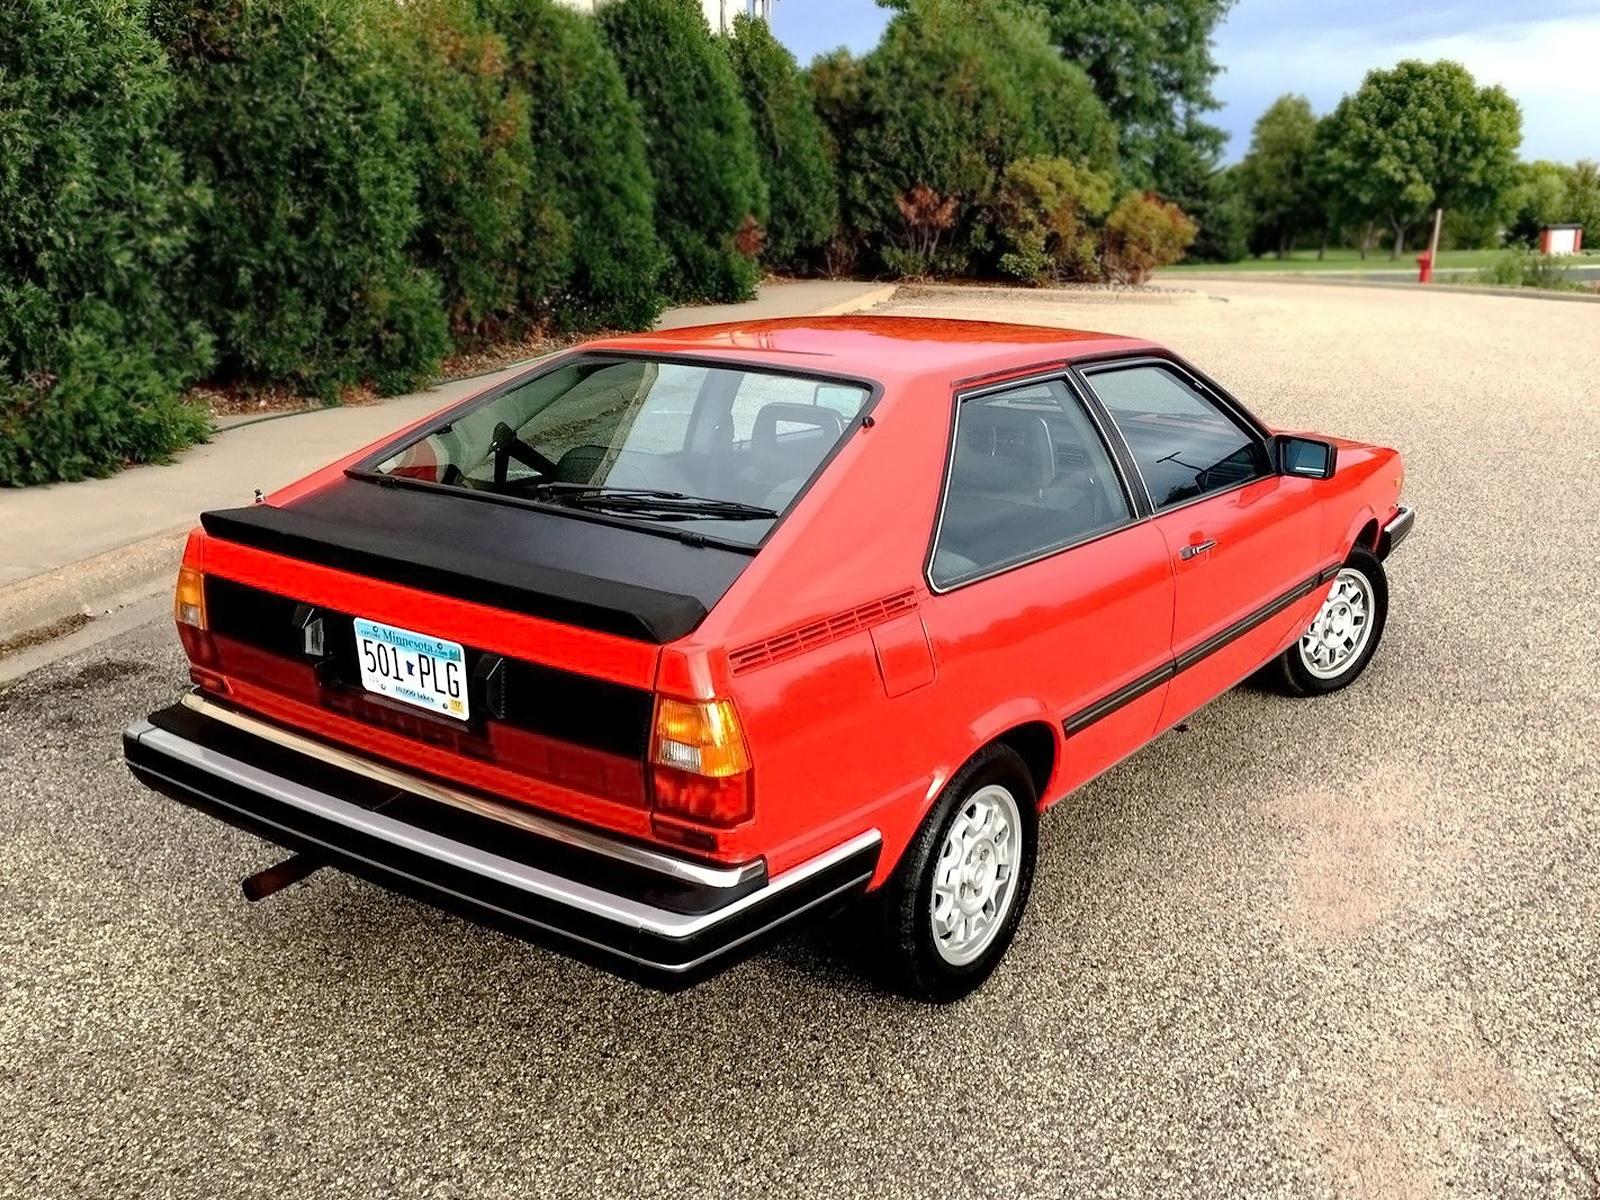 36,000 Mile Original: 1982 Audi Coupé GT